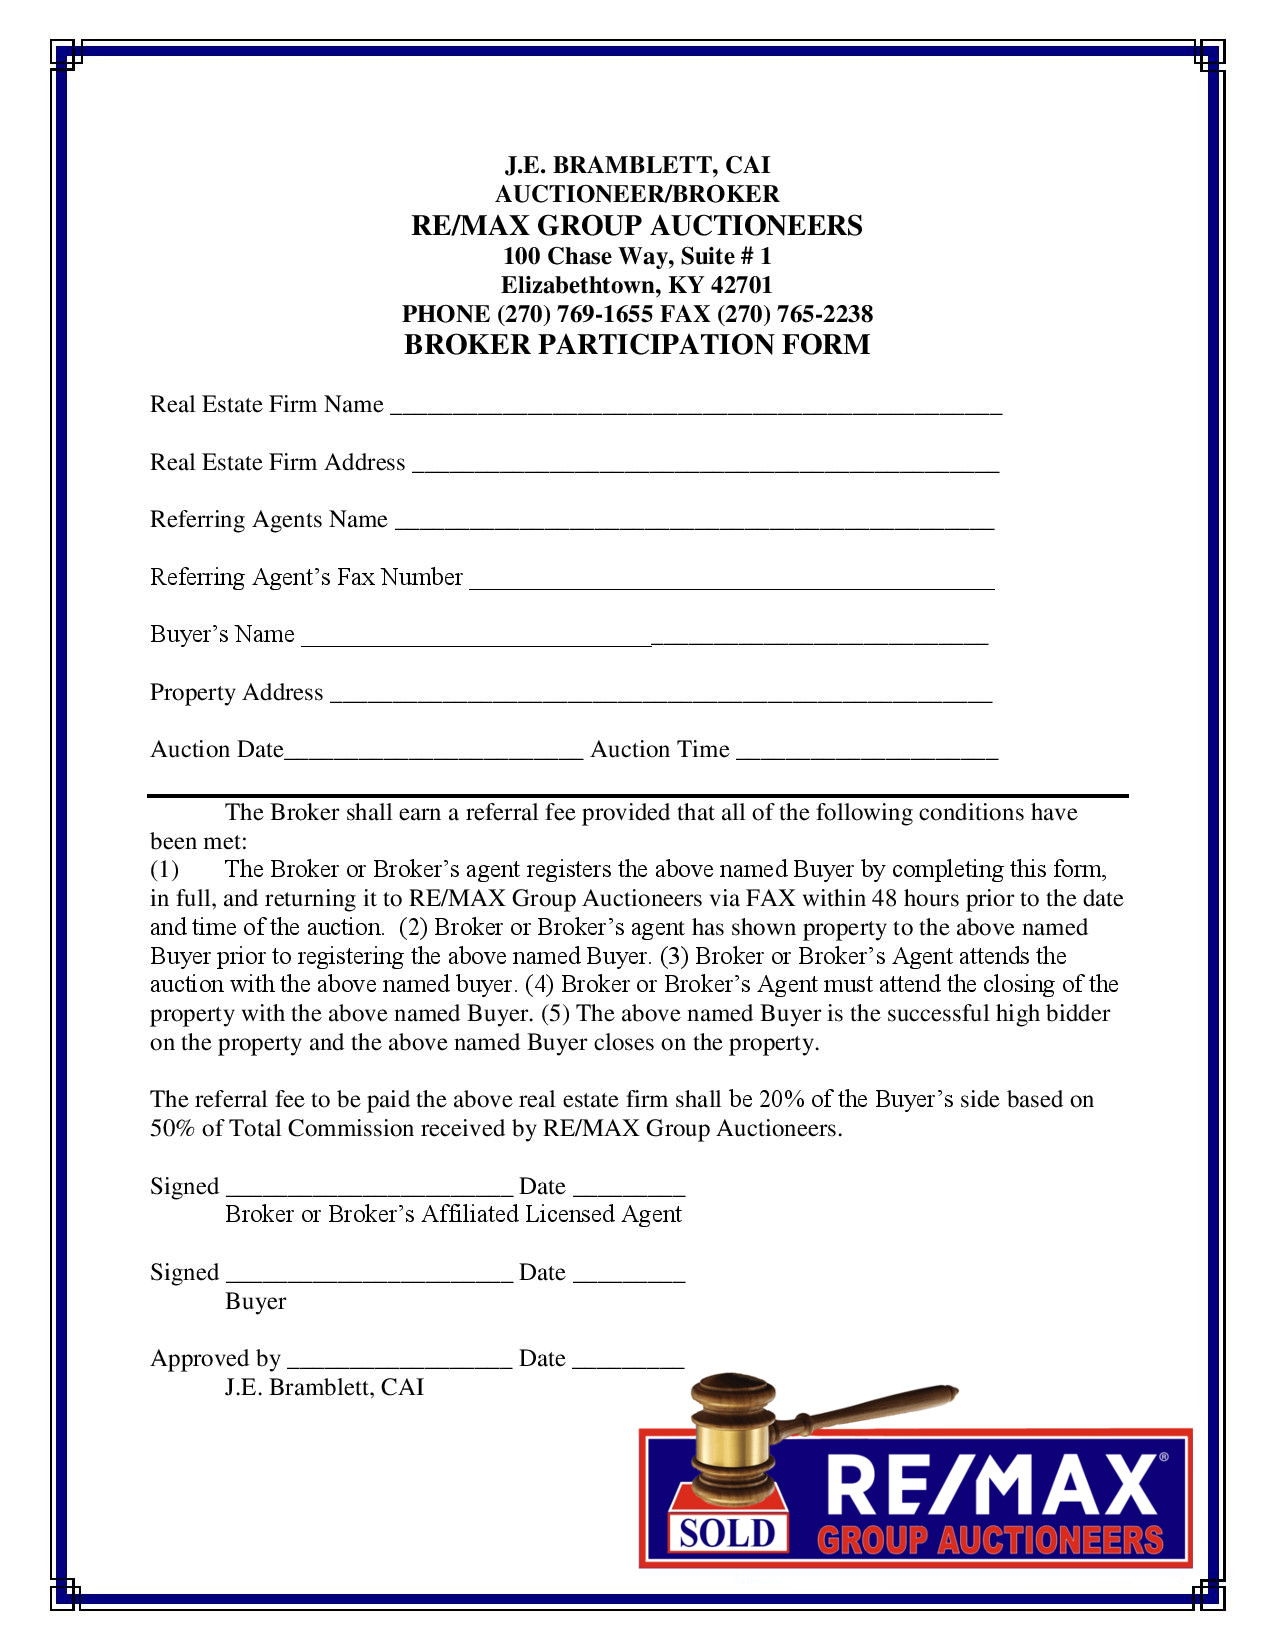 Broker Participation Form